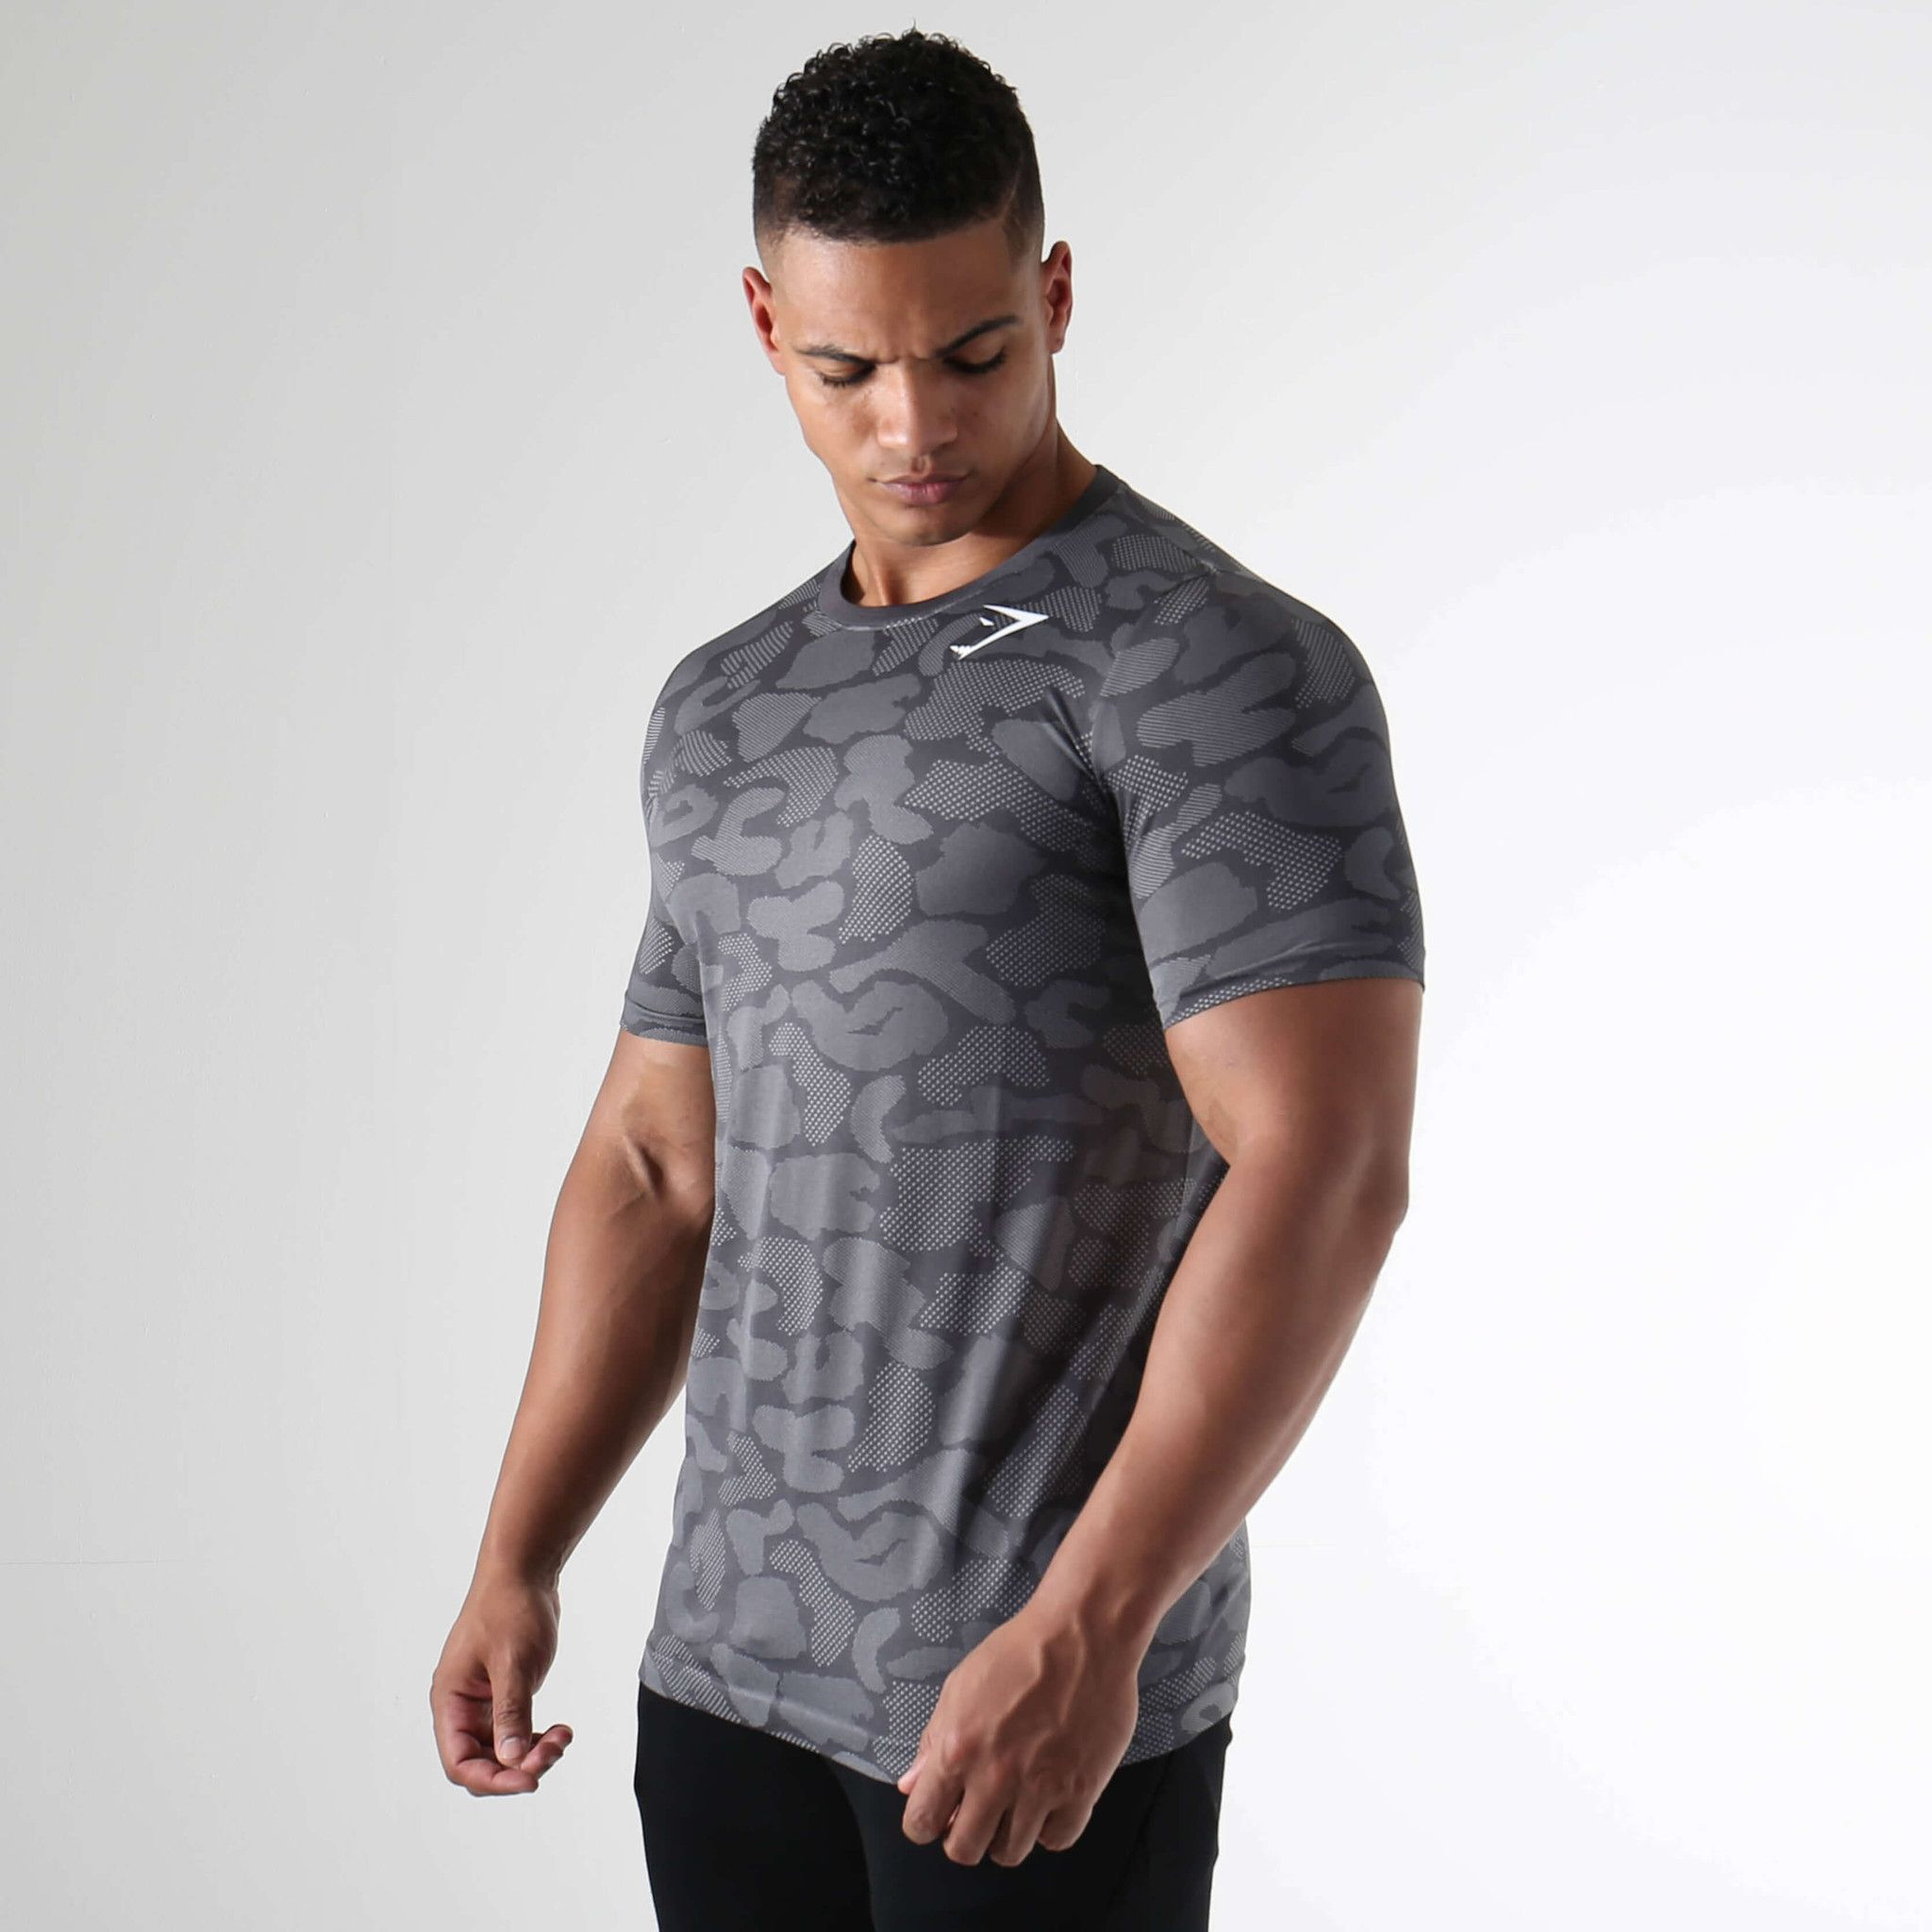 Gymshark Seamless Stealth T-Shirt - Charcoal